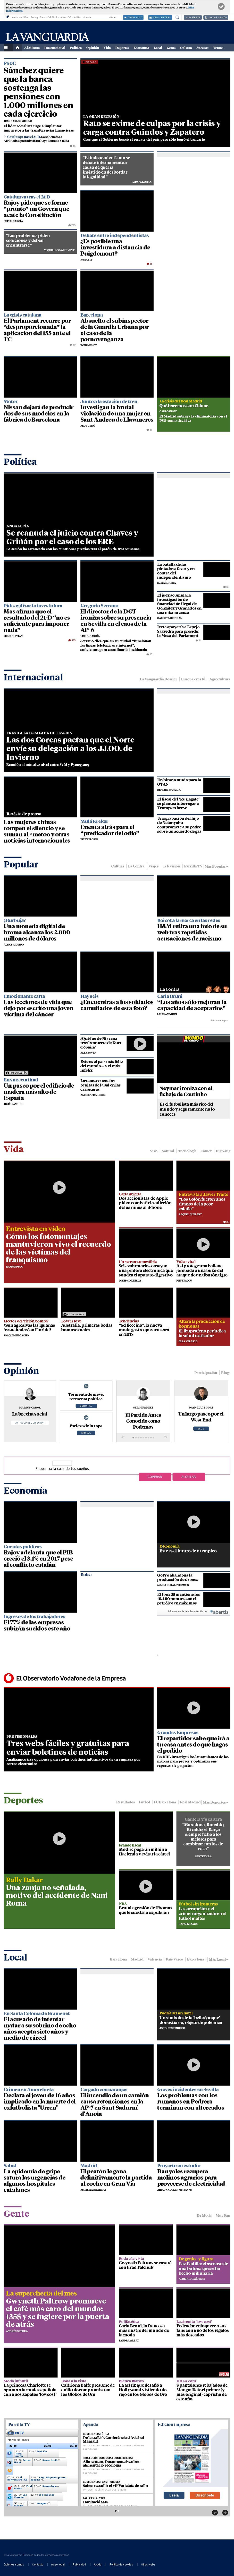 La Vanguardia at Tuesday Jan. 9, 2018, 11:23 a.m. UTC